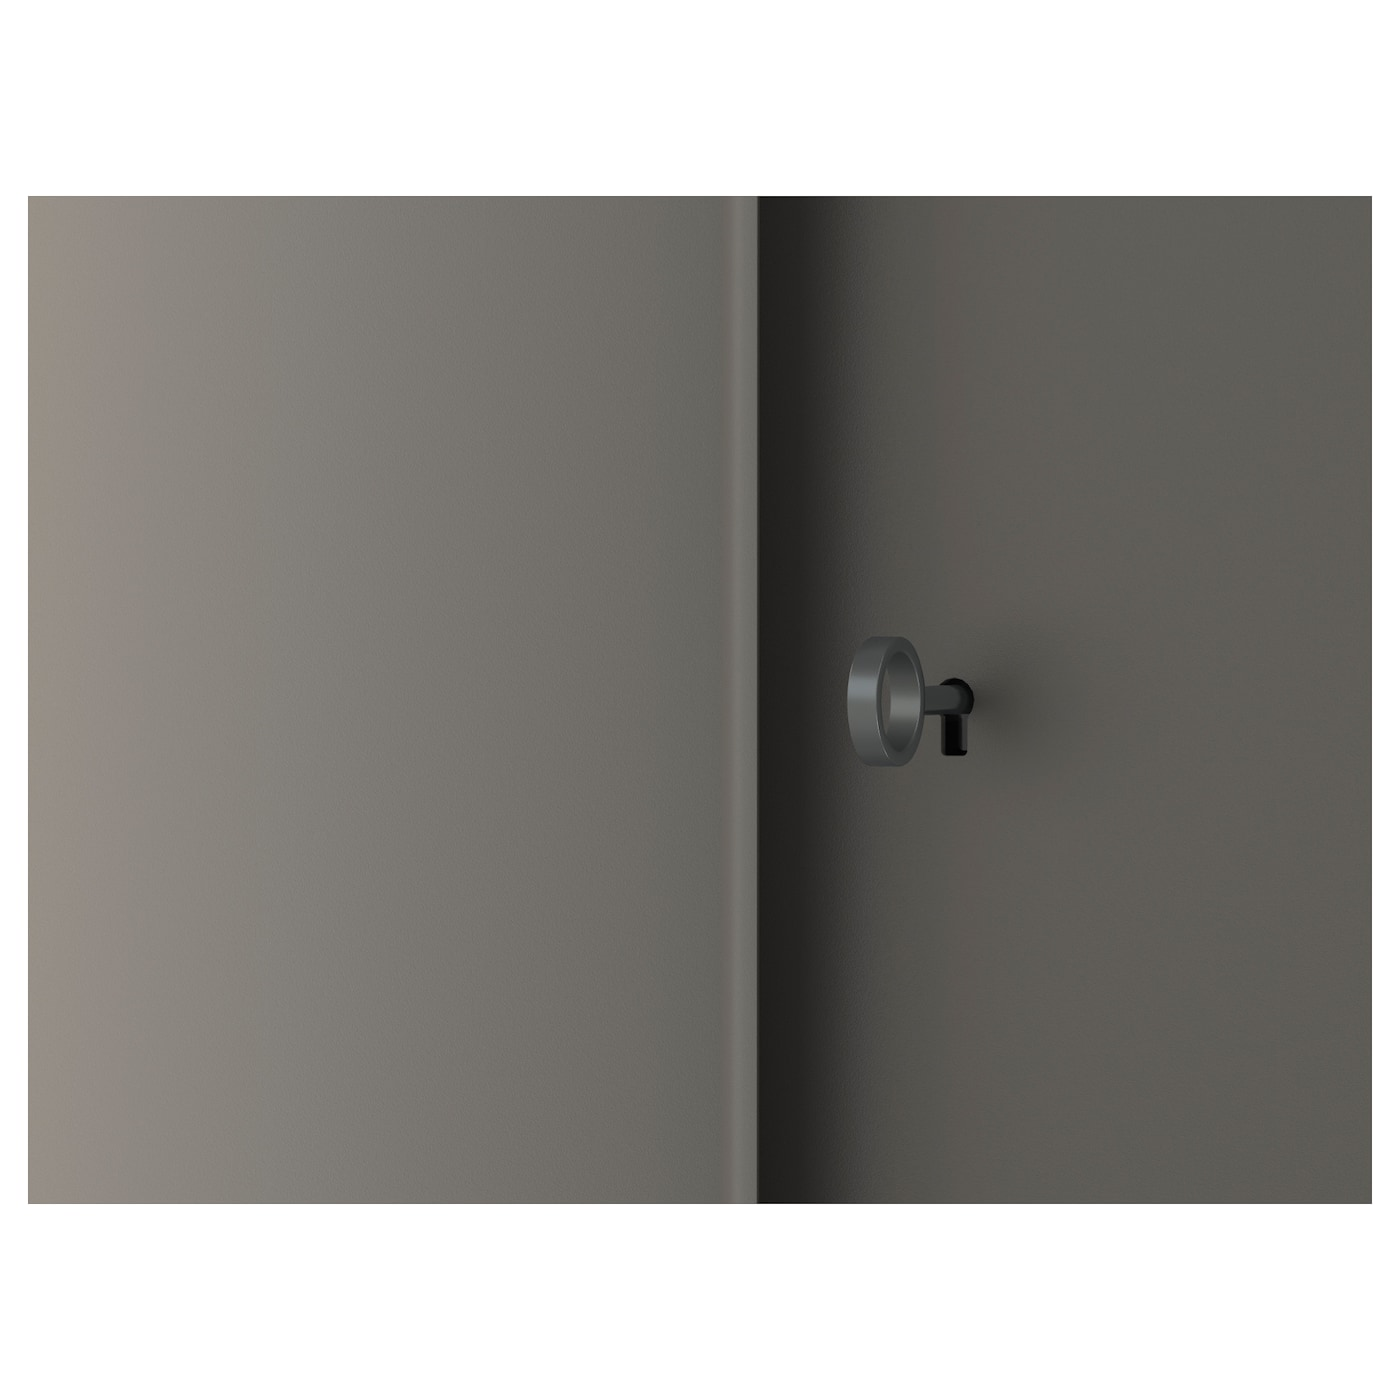 IVAR skåp med dörrar grå 80 cm 30 cm 83 cm 25 kg